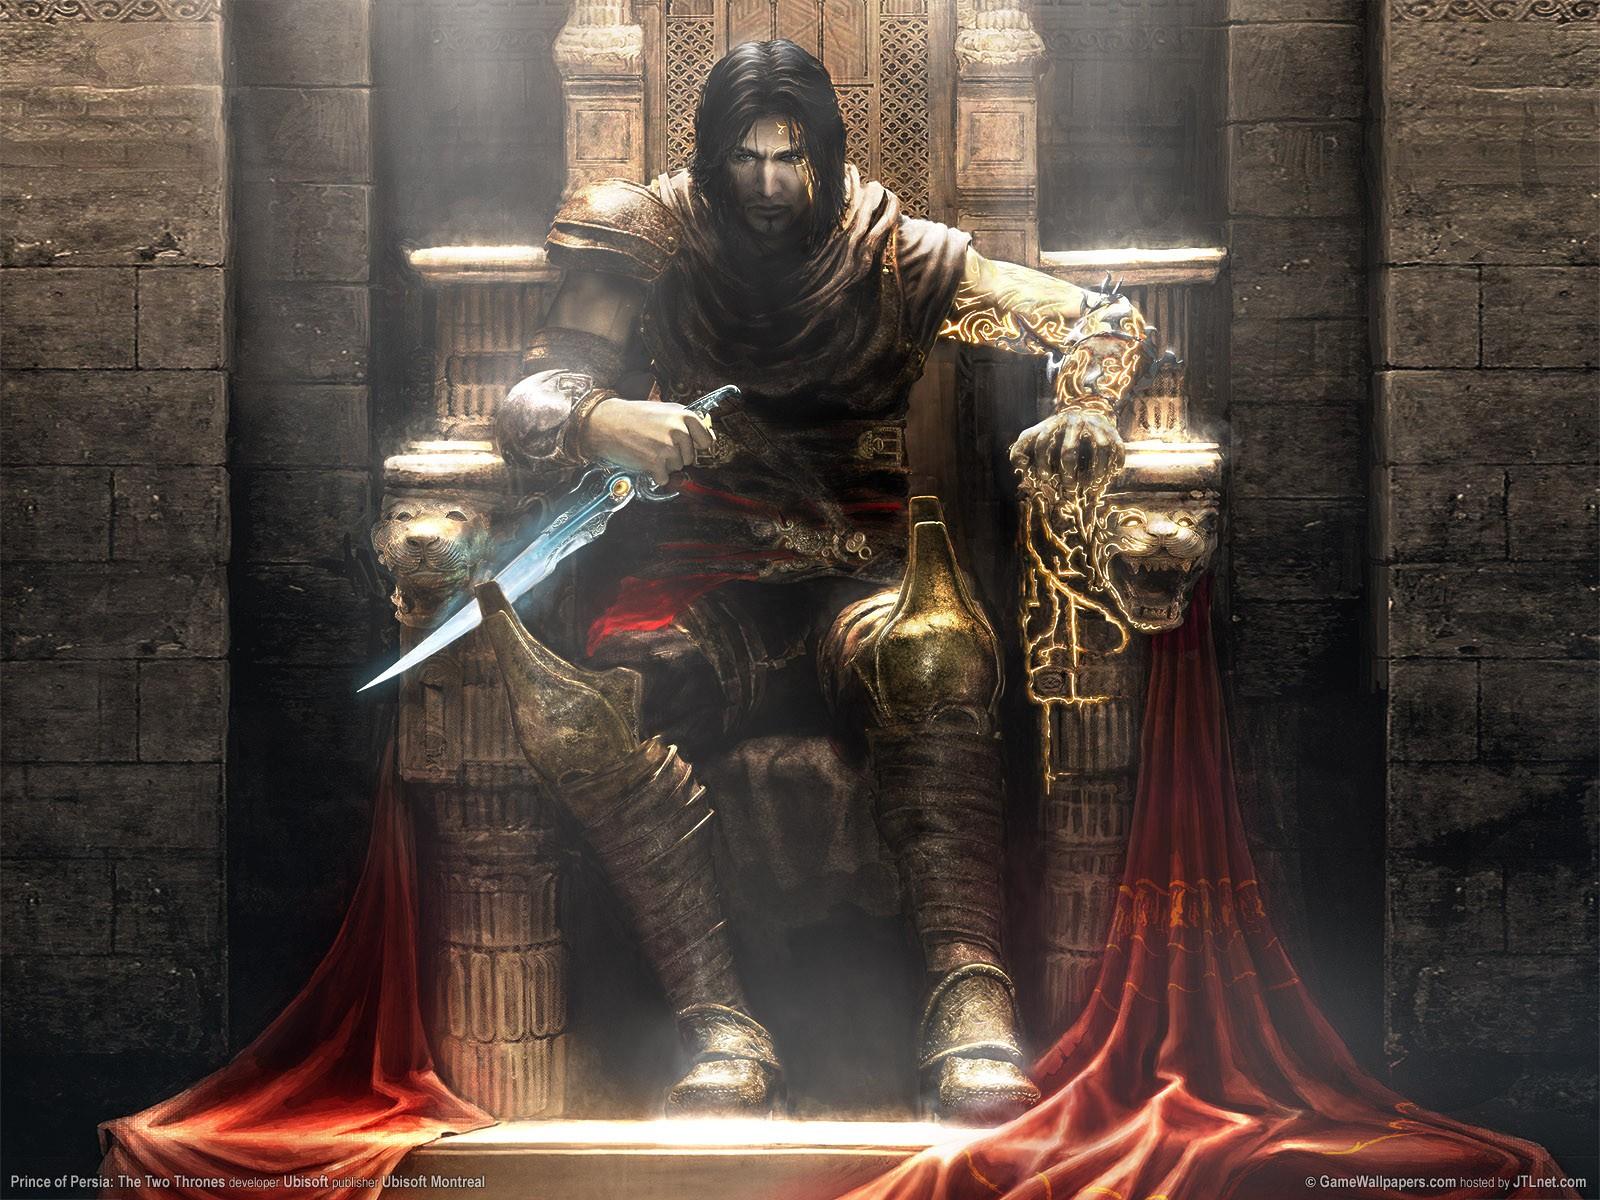 General 1600x1200 Prince of Persia: The Two Thrones video games video game art video game man throne sitting Fantasy Men fantasy art Ubisoft